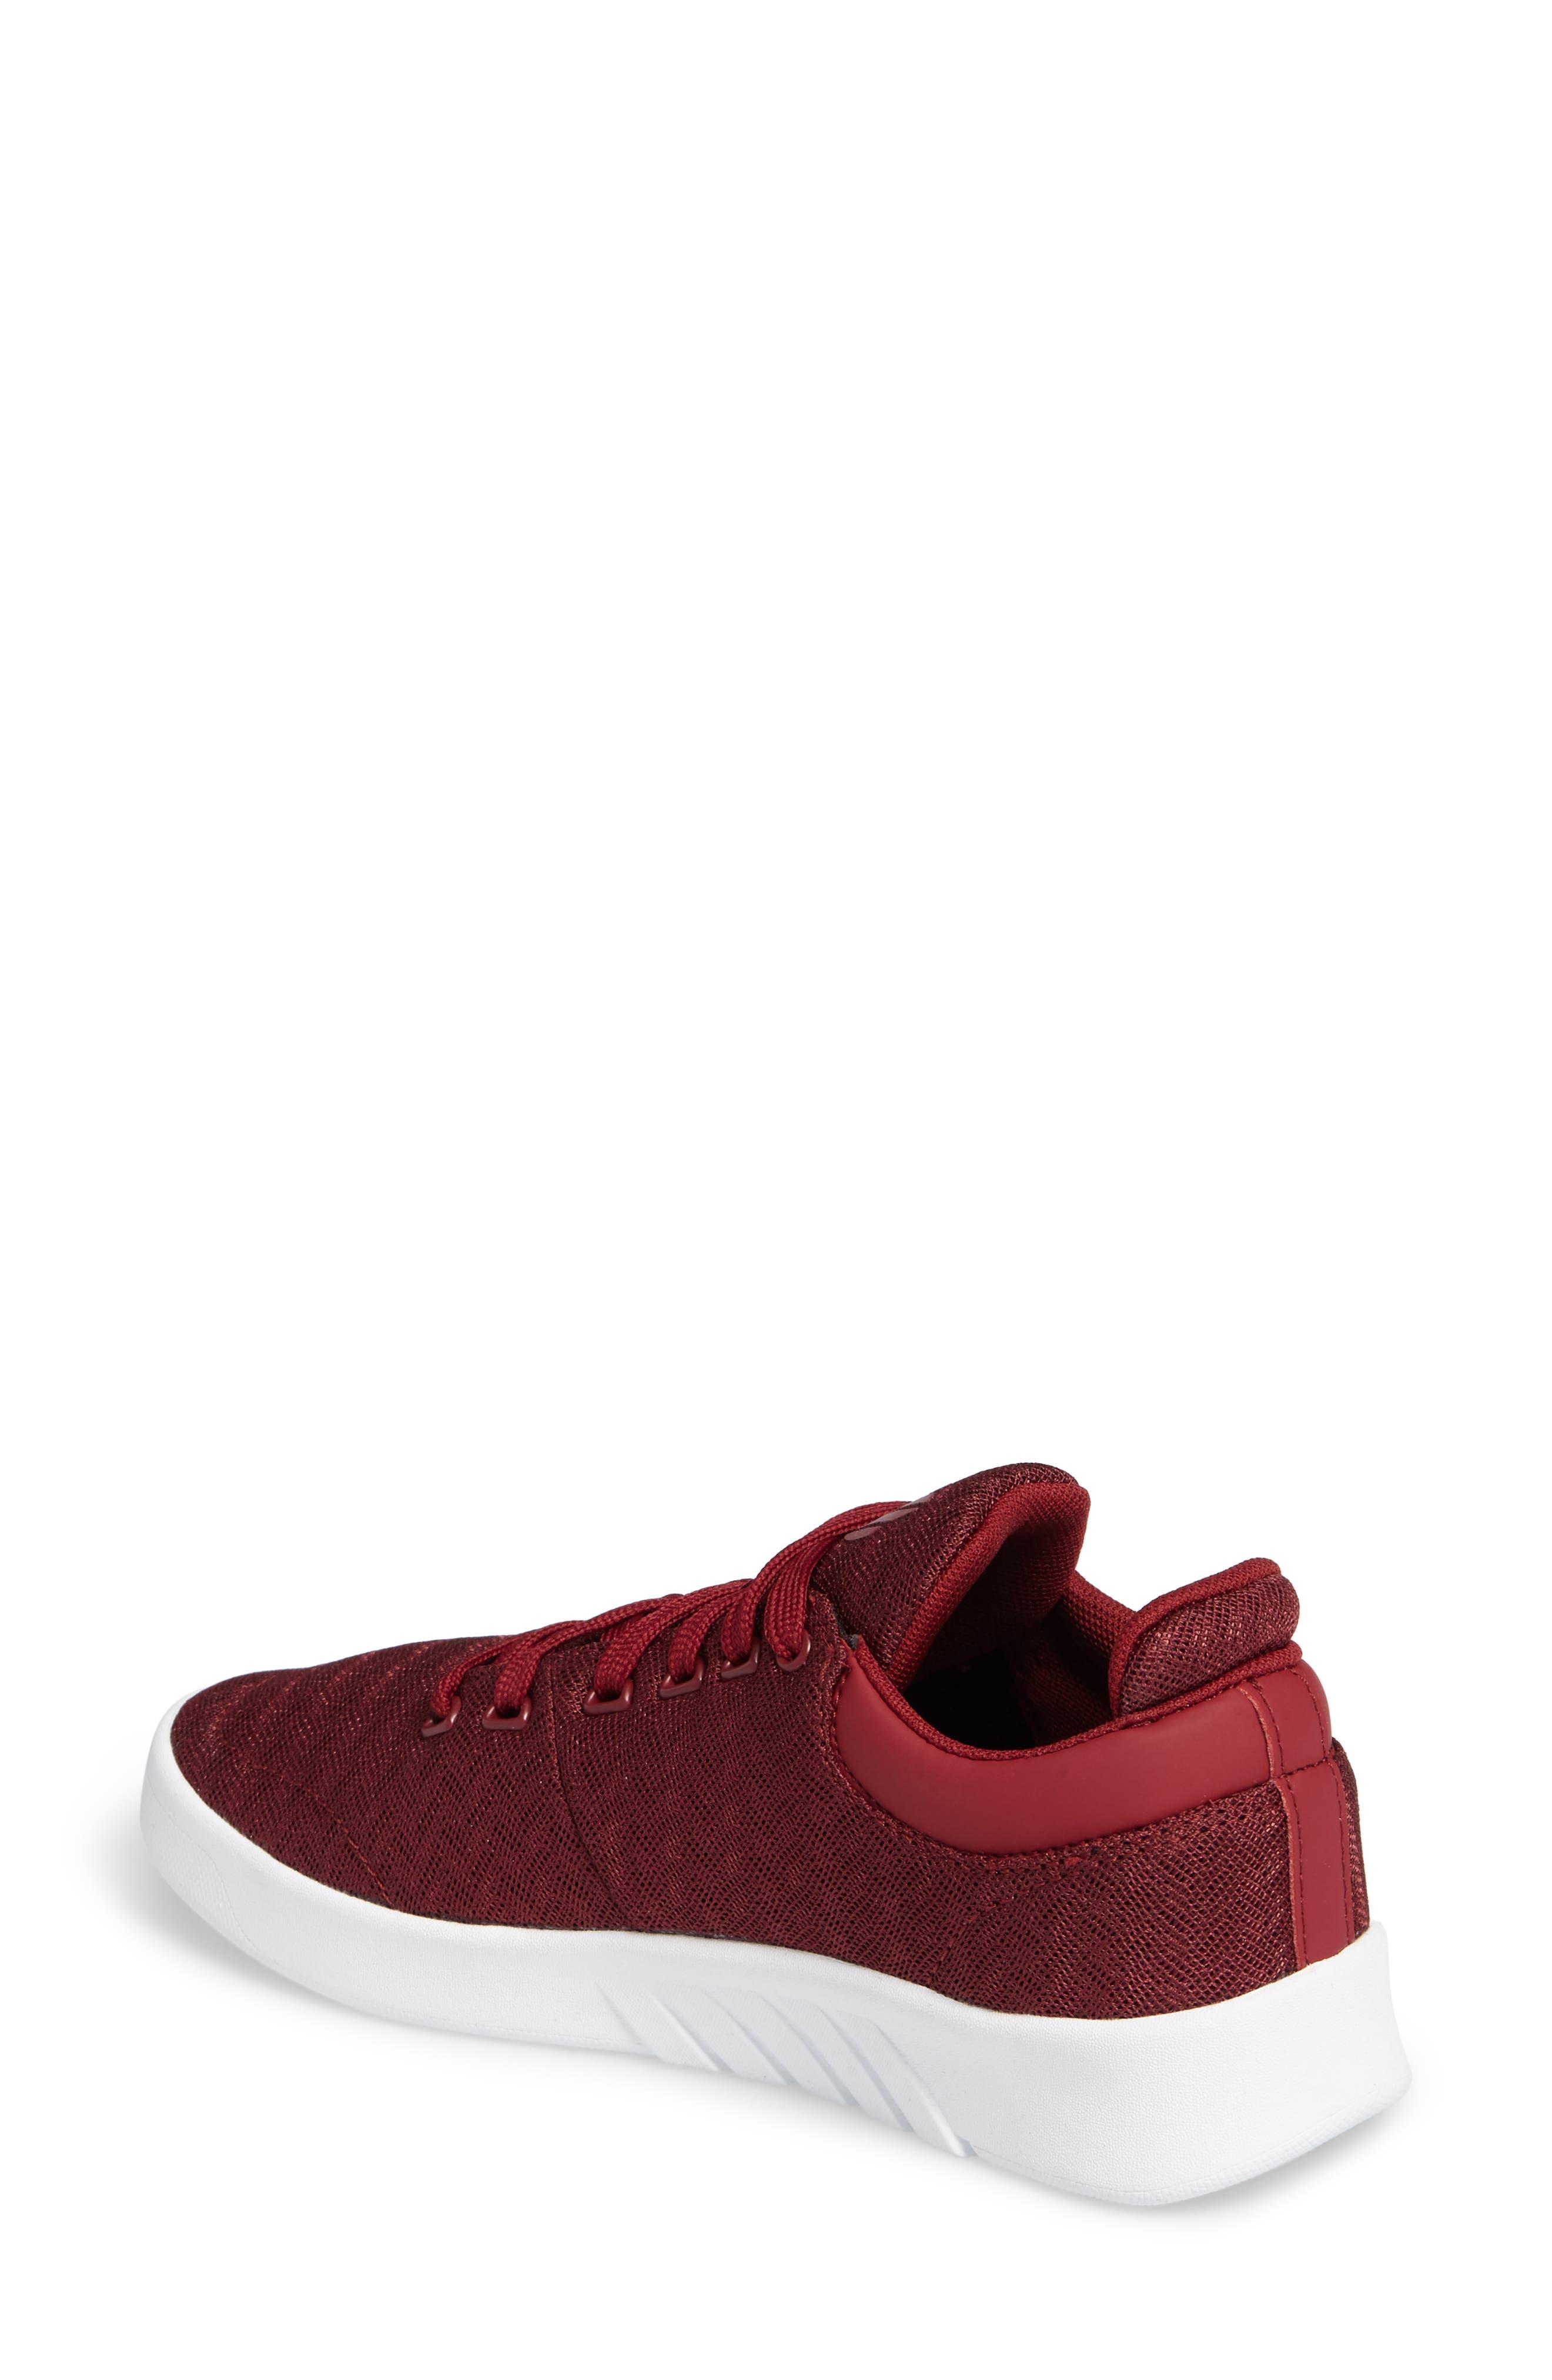 Aero Trainer T Sneaker,                             Alternate thumbnail 2, color,                             Tibetan Red/ White